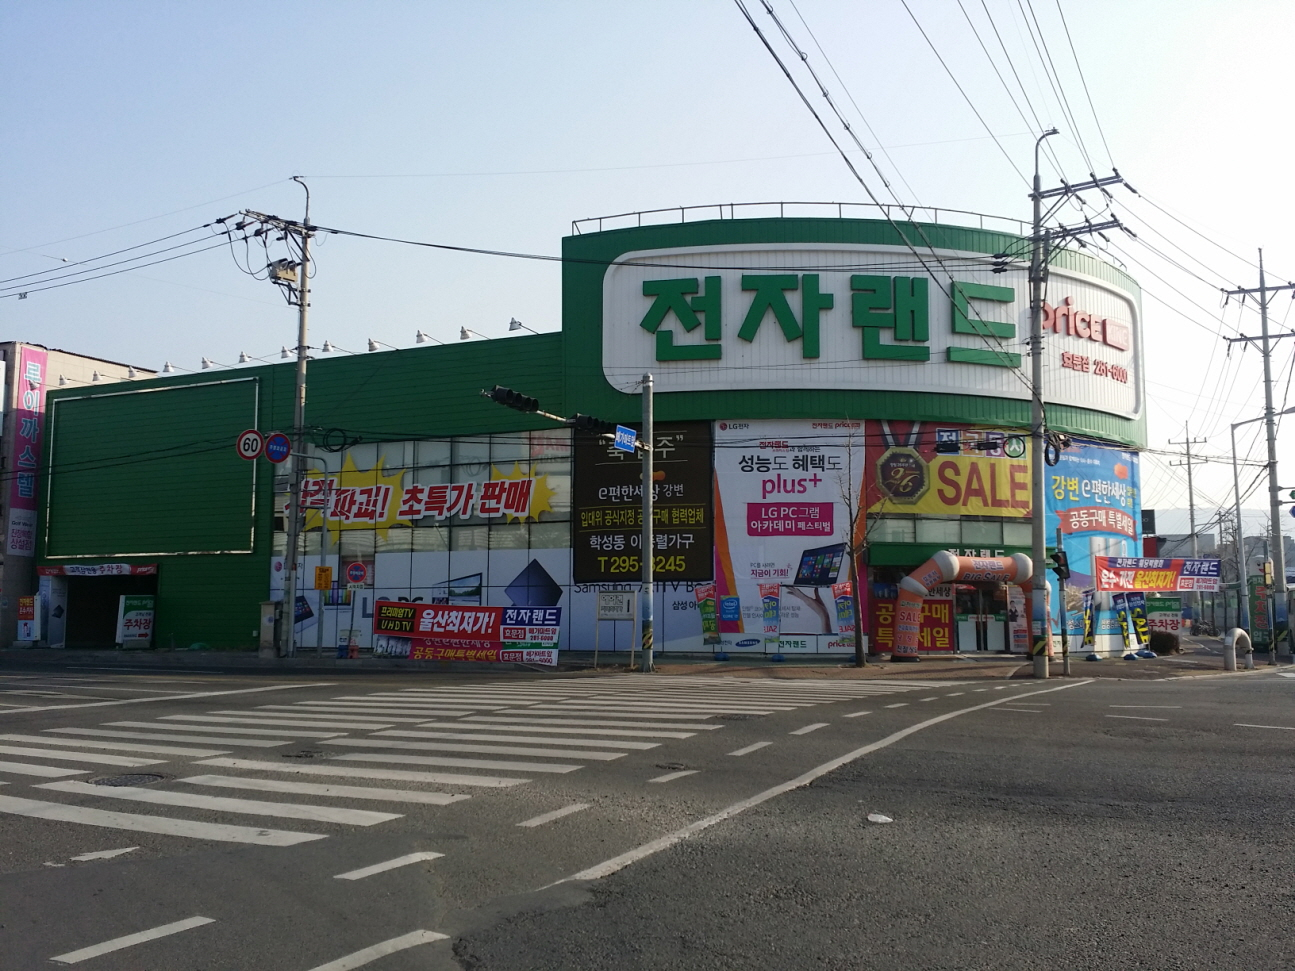 Price King电子商城孝门店 (전자랜드 프라이스킹 효문점)